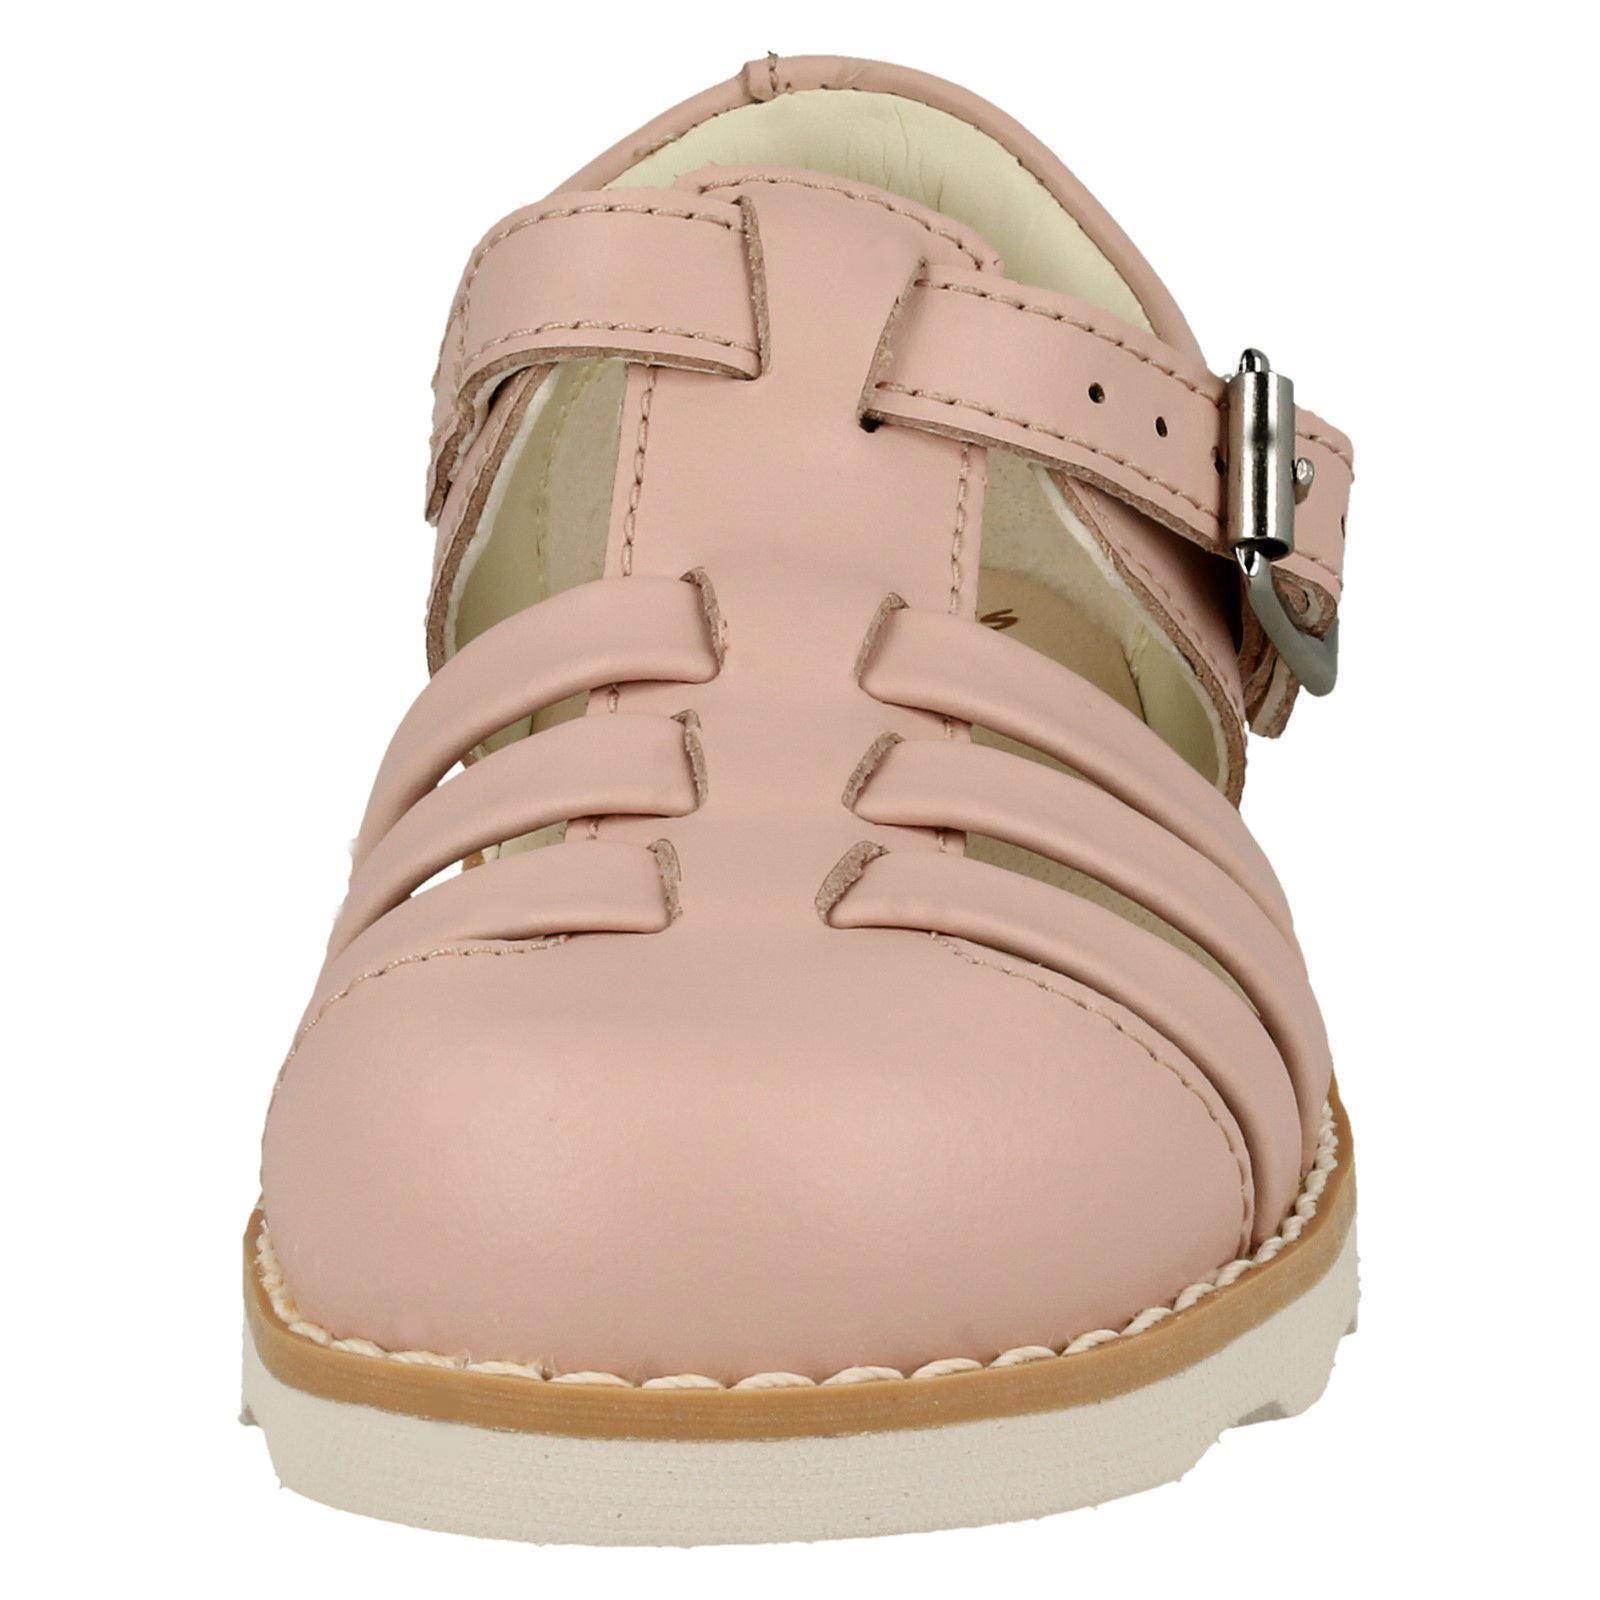 Childrens Boys Girls Clarks Closed Toe Sandals /'Crown Stem/'